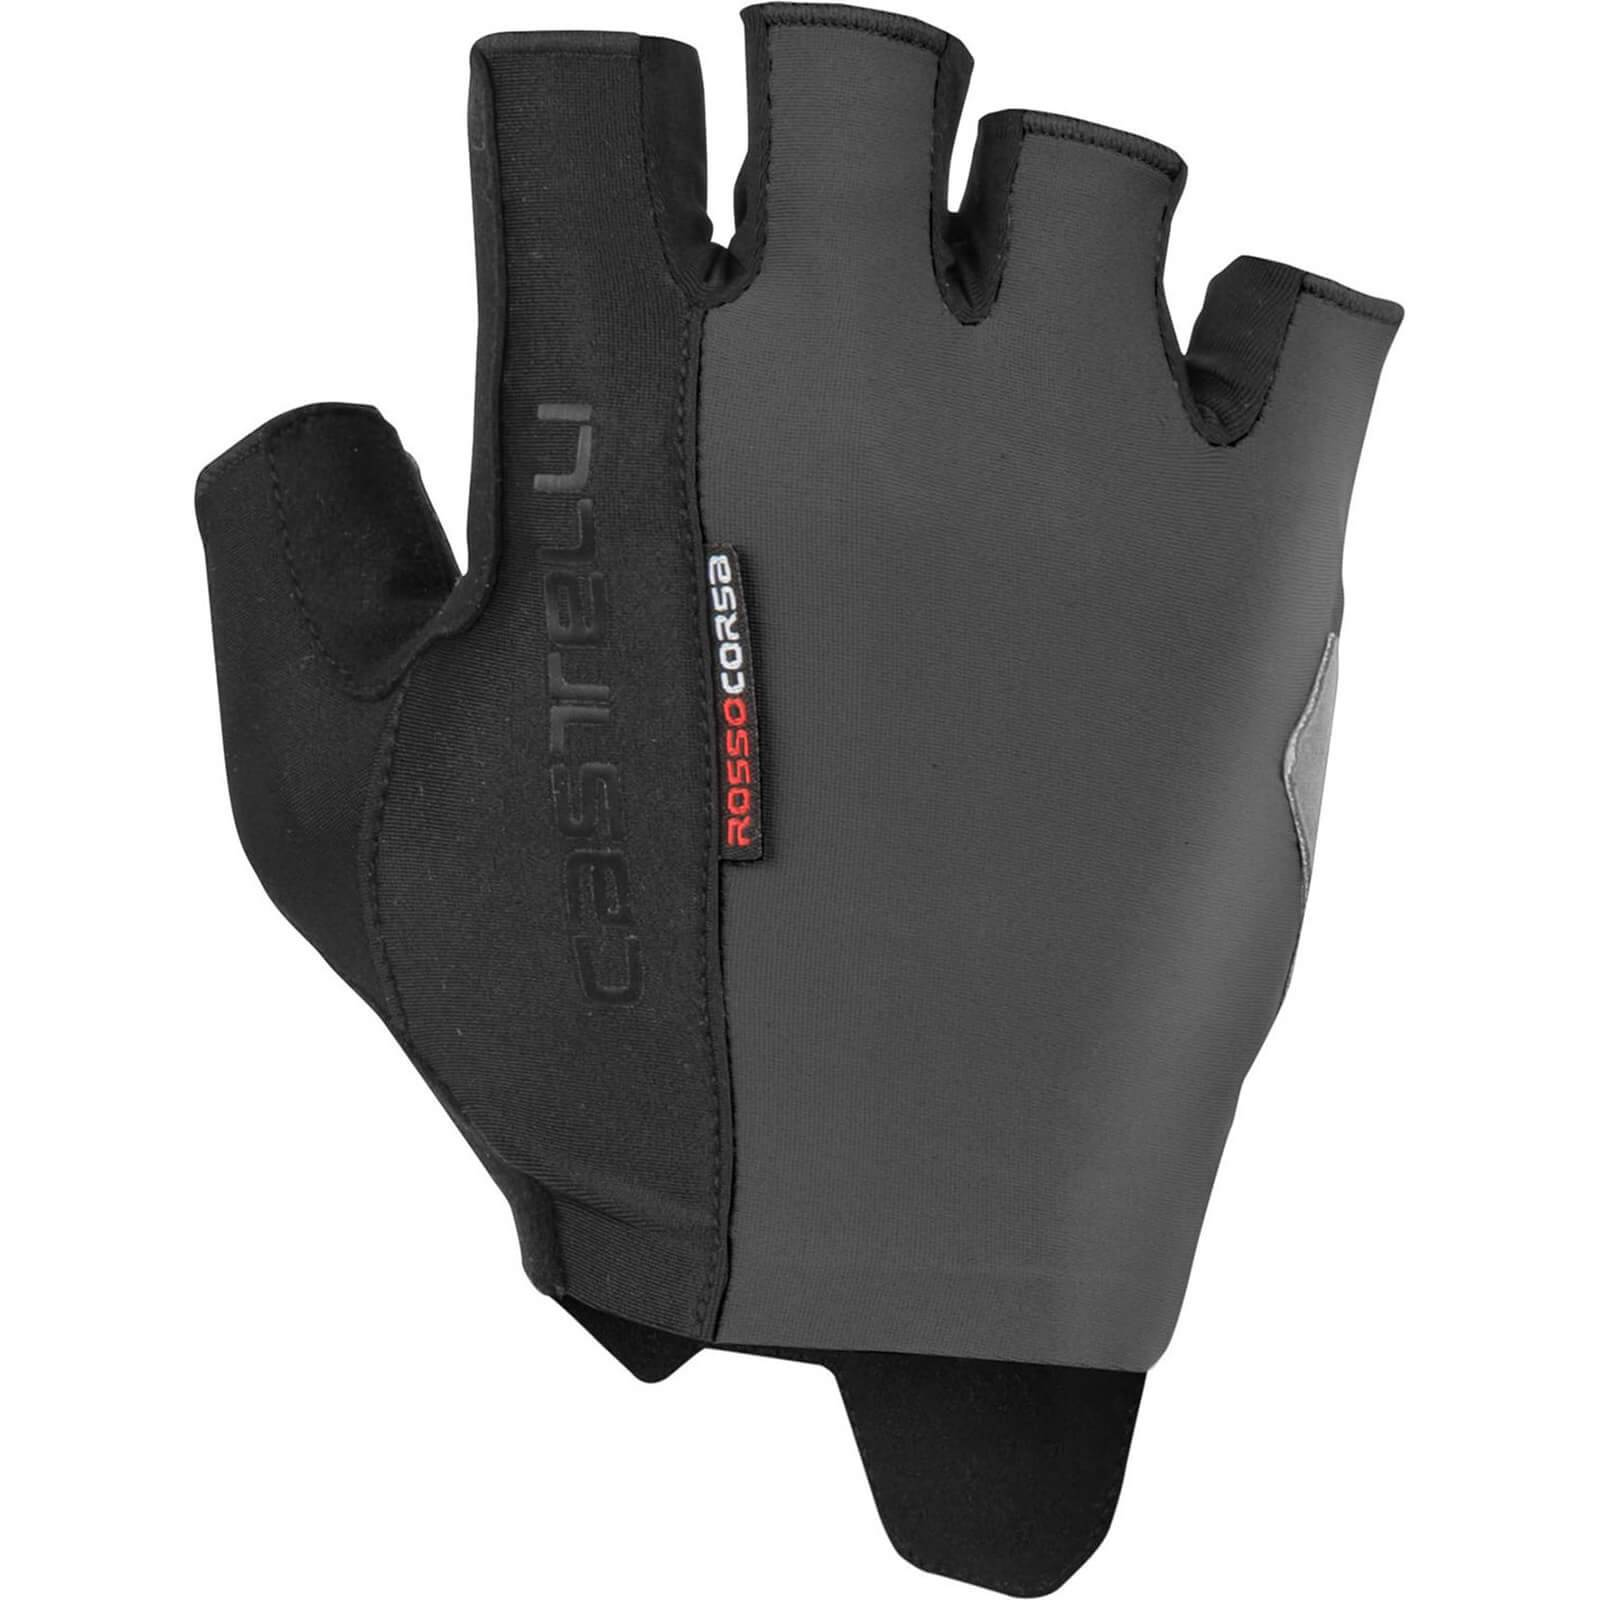 Castelli Rosso Corsa Espresso Gloves - XL - Dark Grey